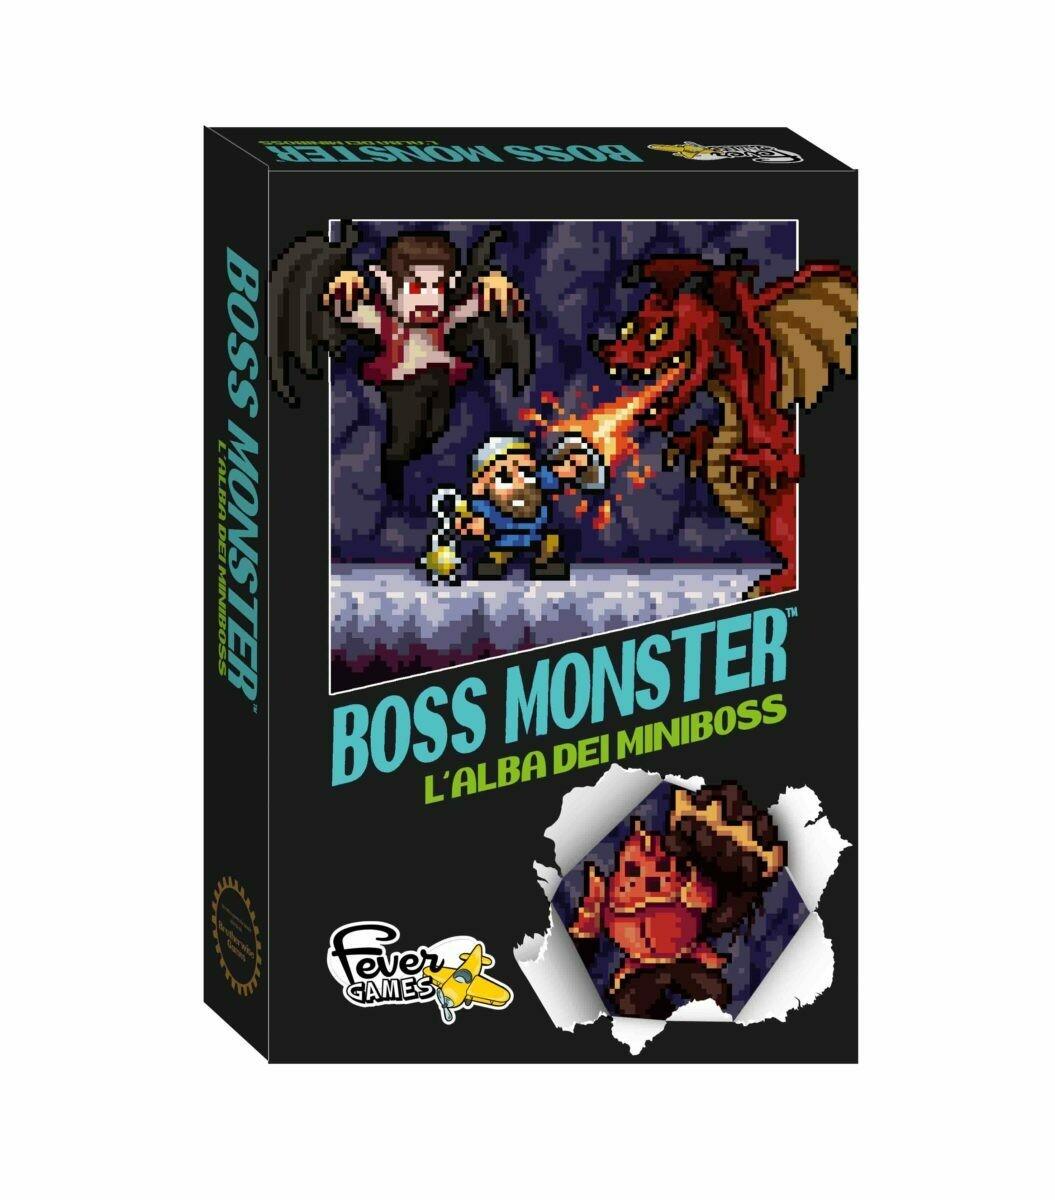 Boss Monster - L'alba dei miniboss